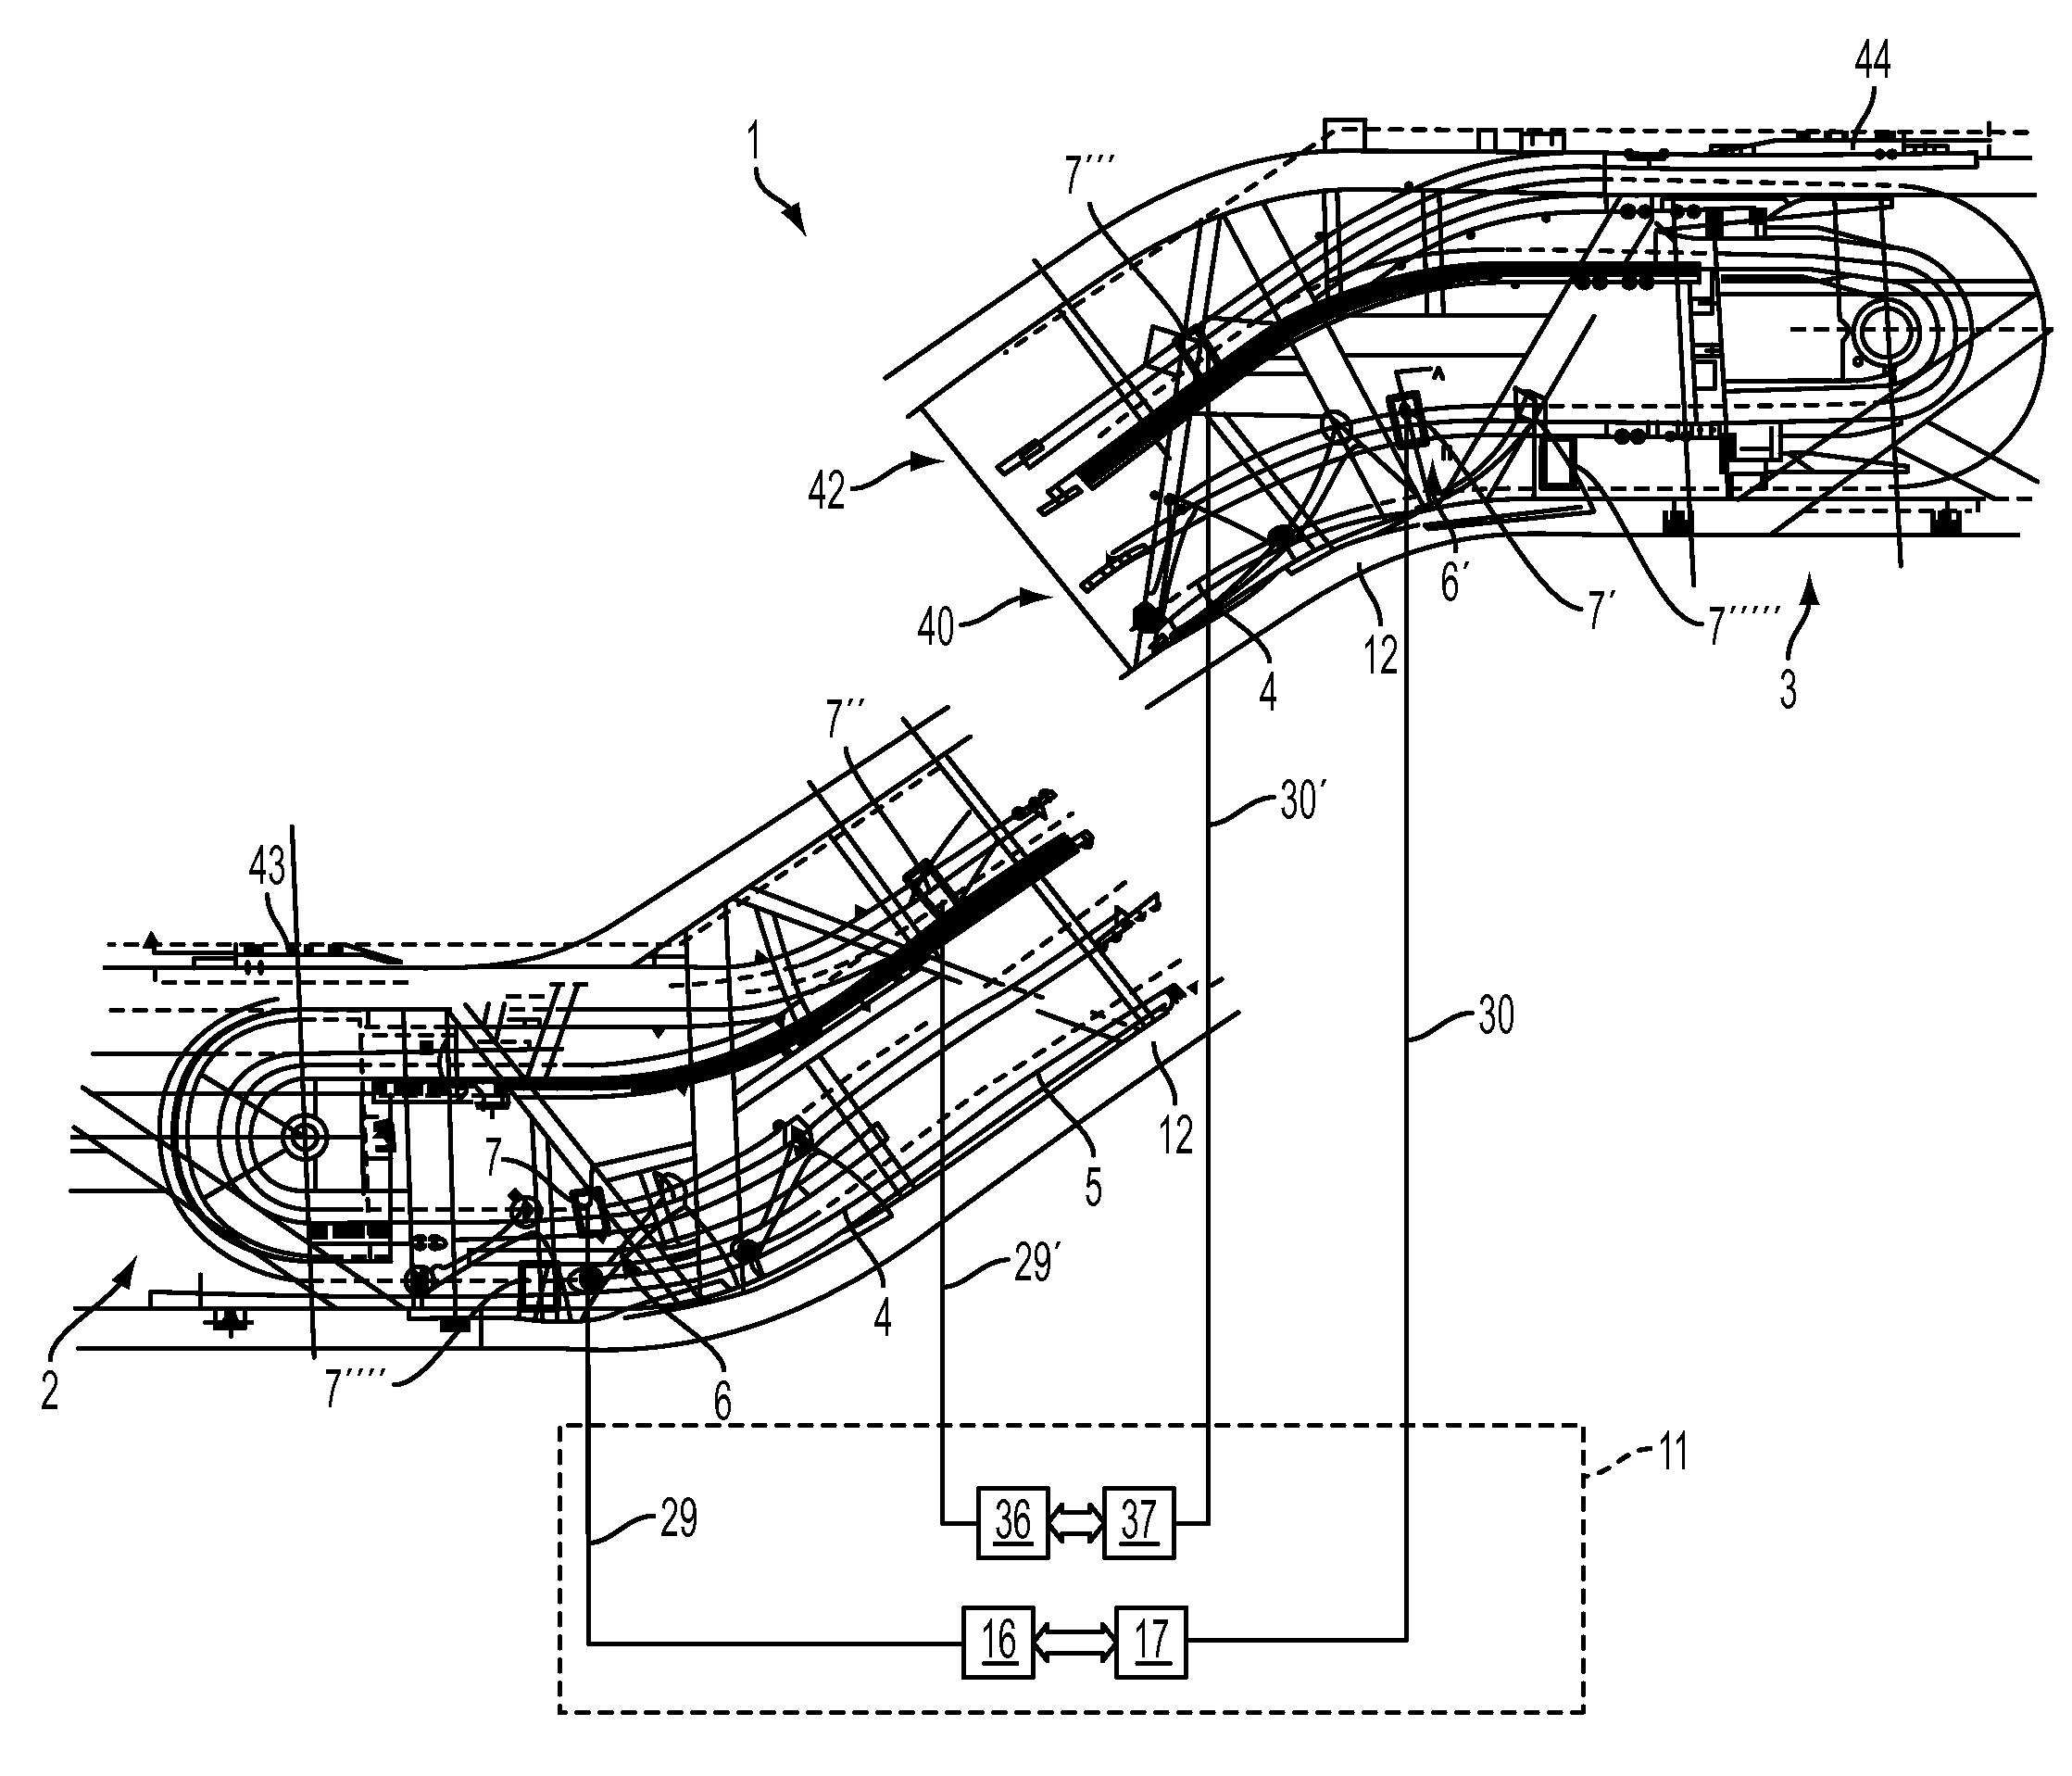 escalator schematic diagram